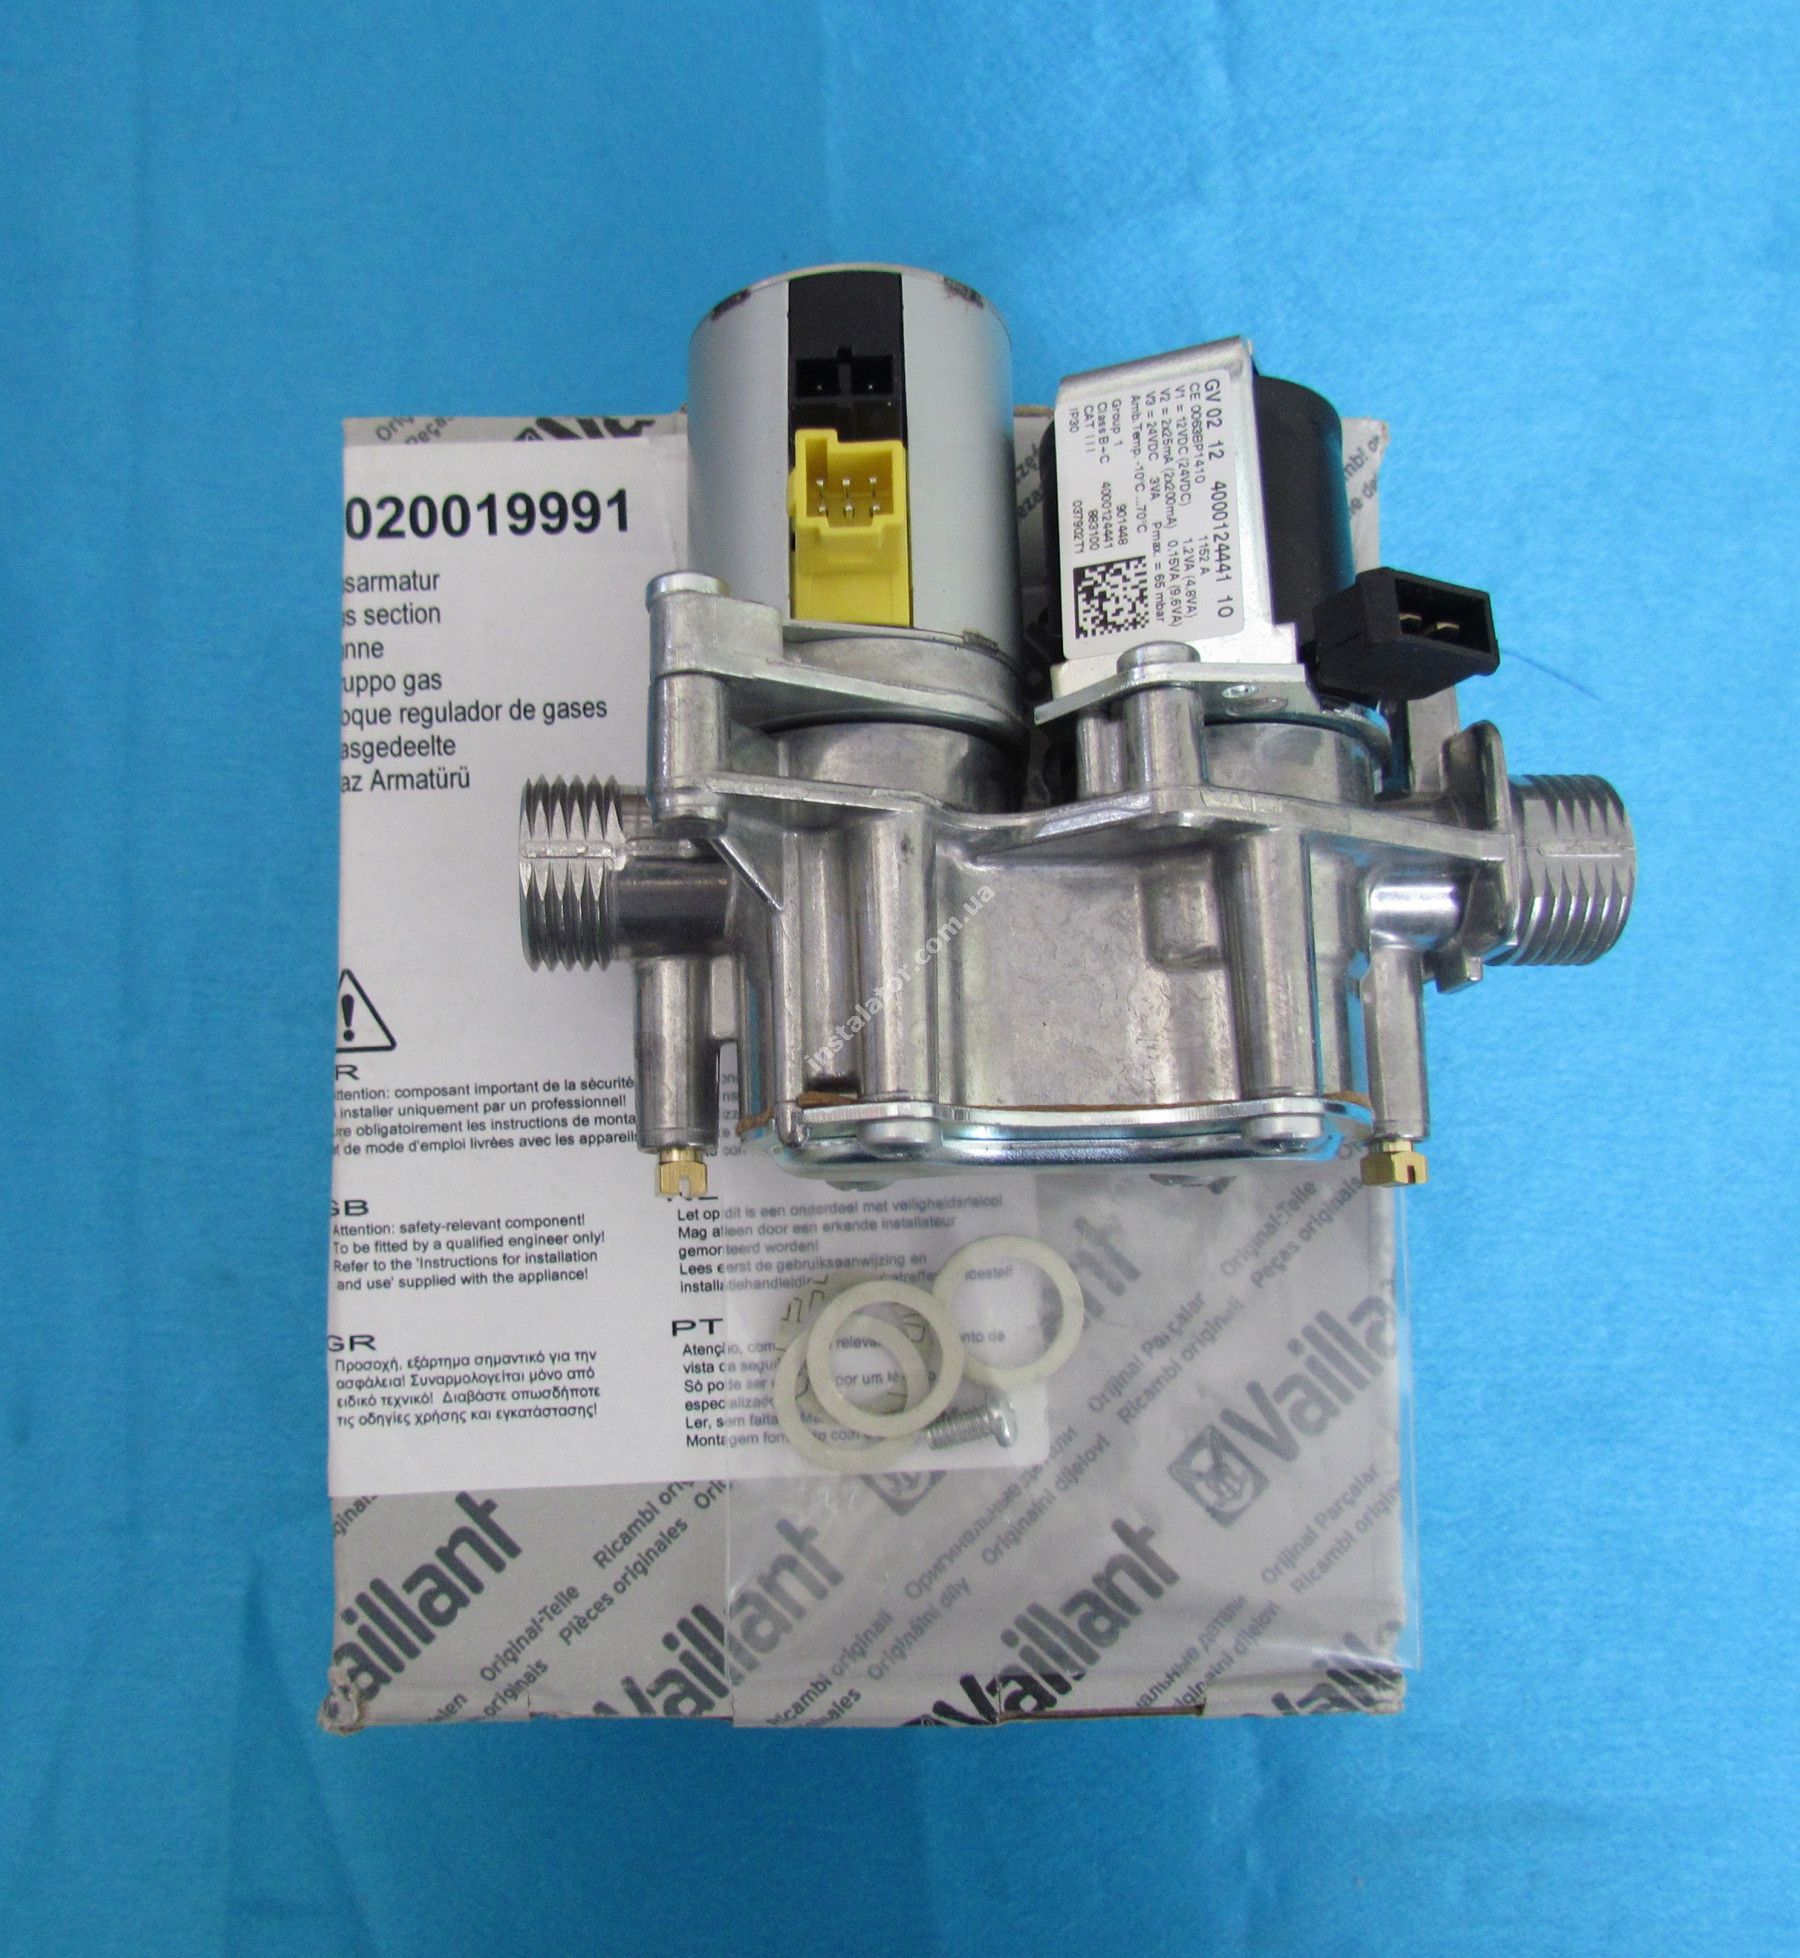 0020019991 Газовый клапан VAILLANT atmoTEC Pro / turboTEC Pro full-image-3